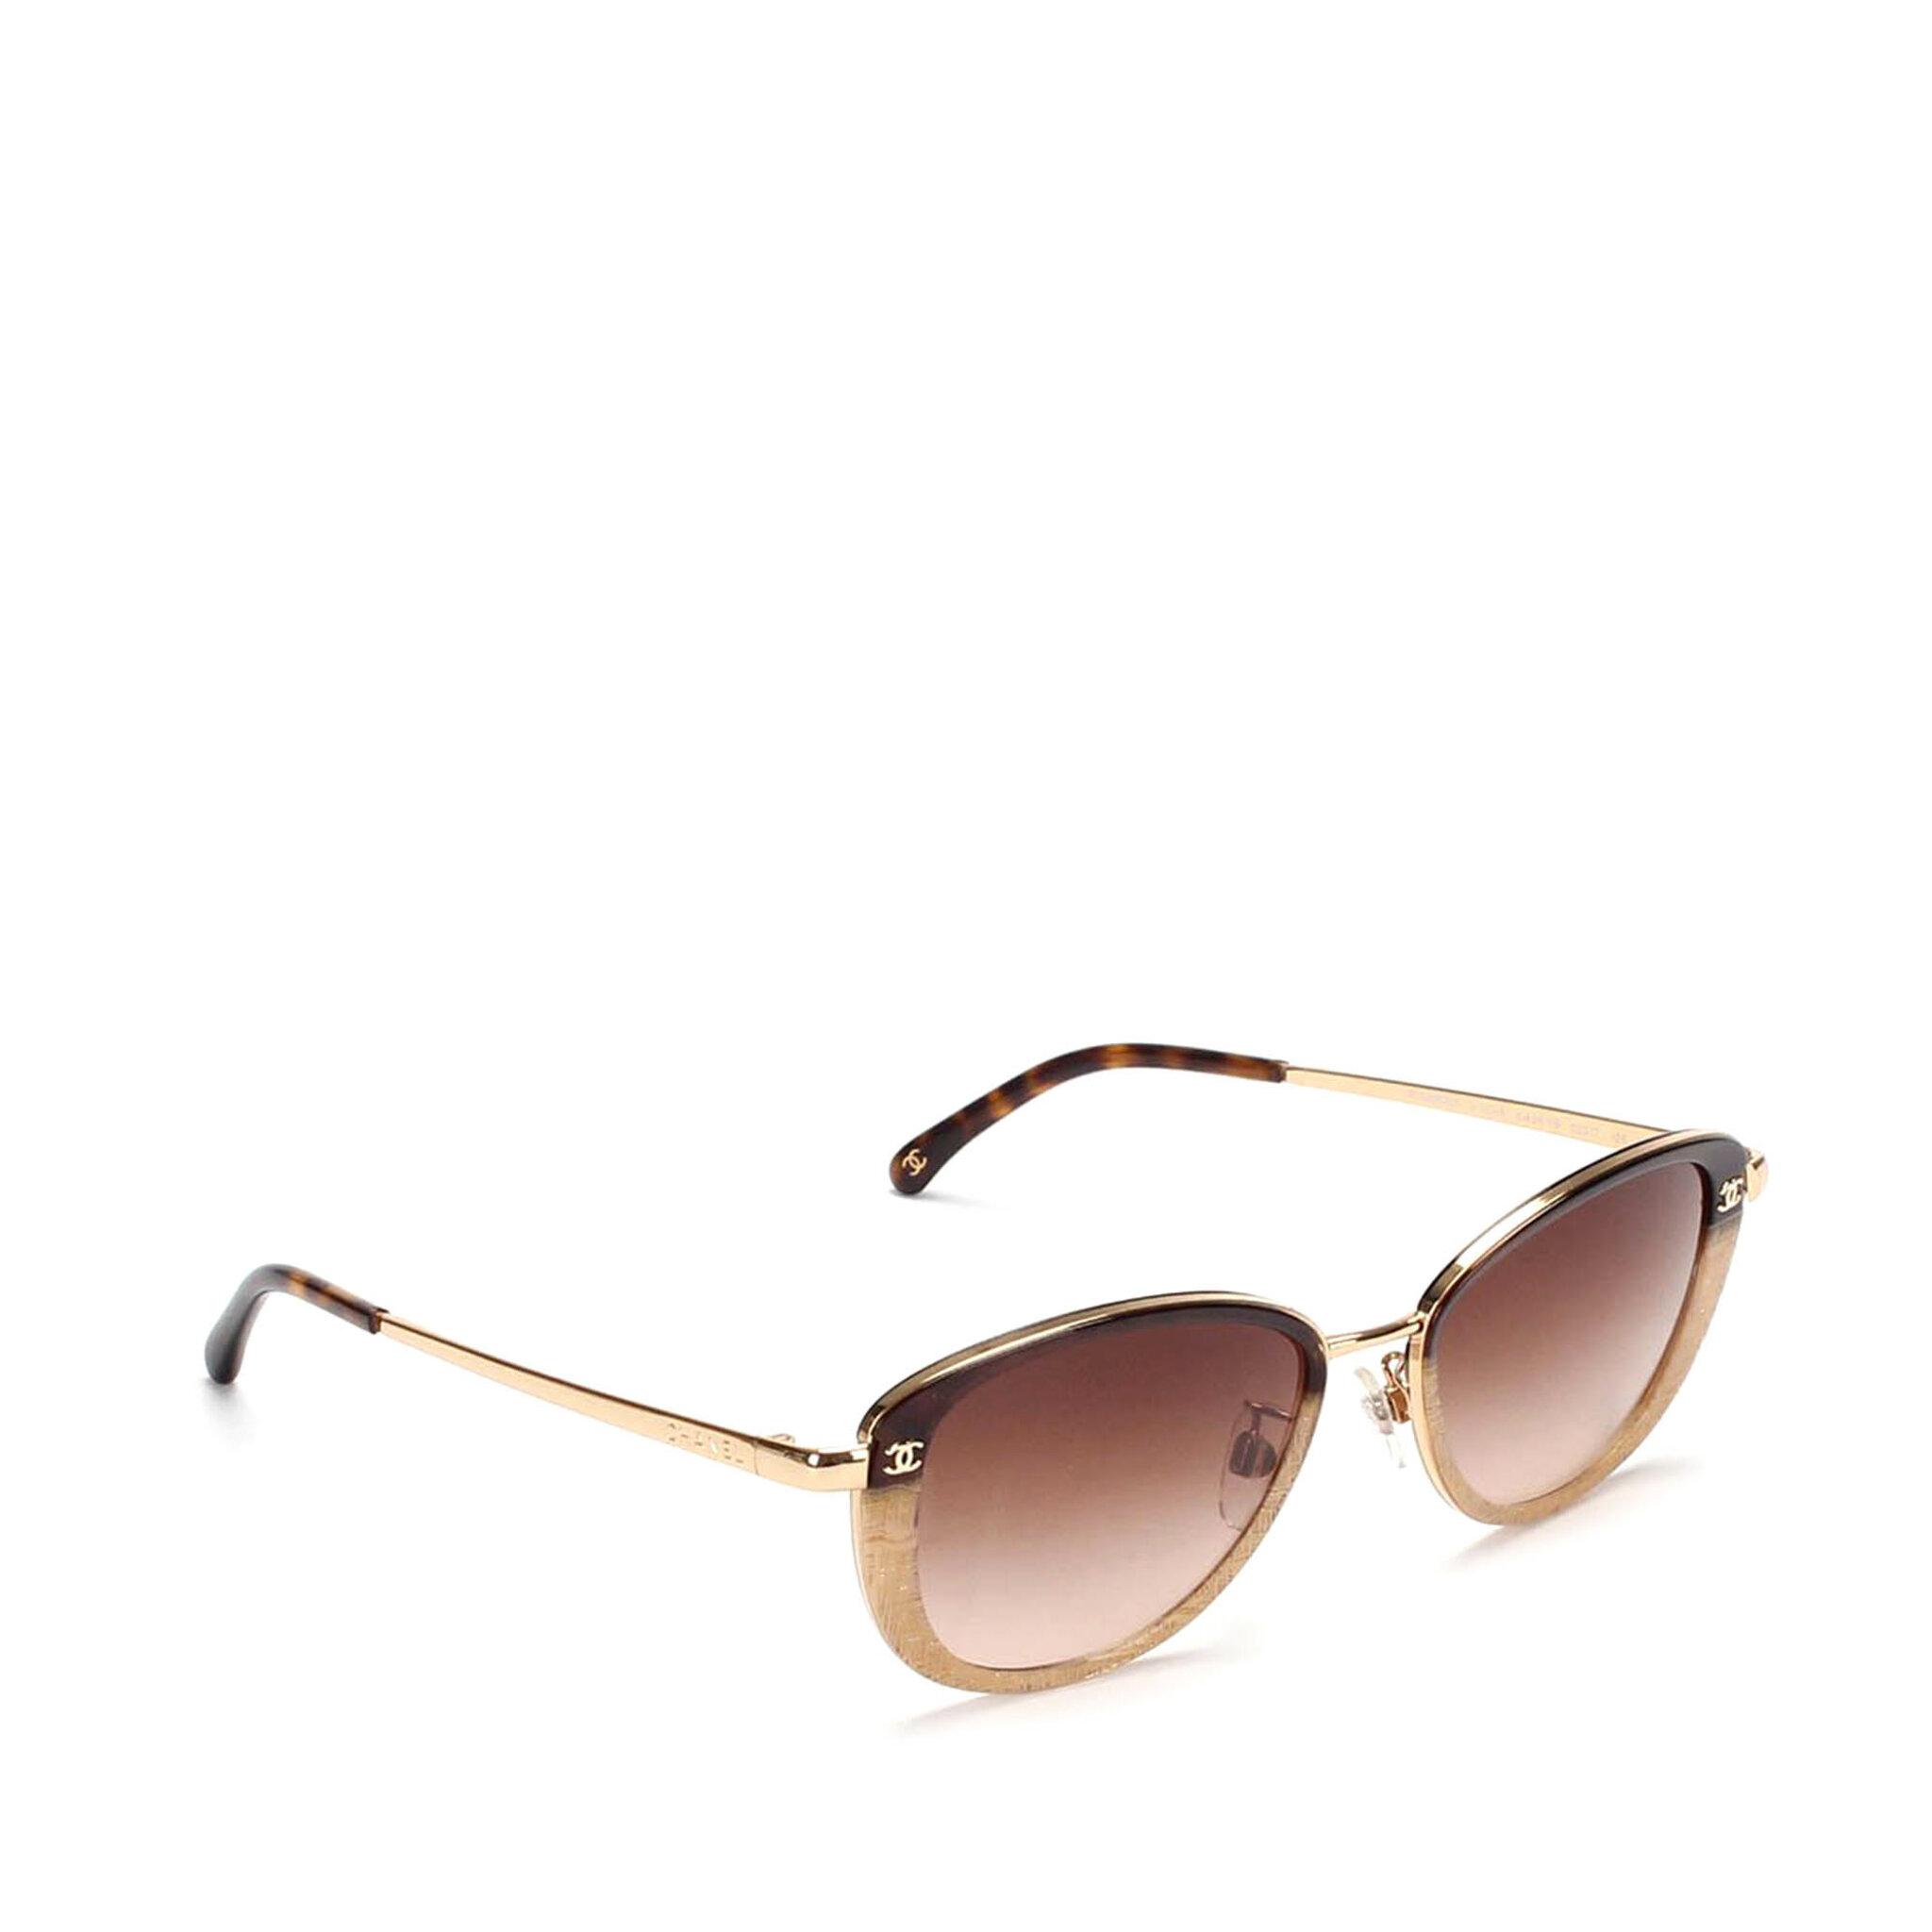 Chanel Cc Round Tinted Sunglasses, ONESIZE